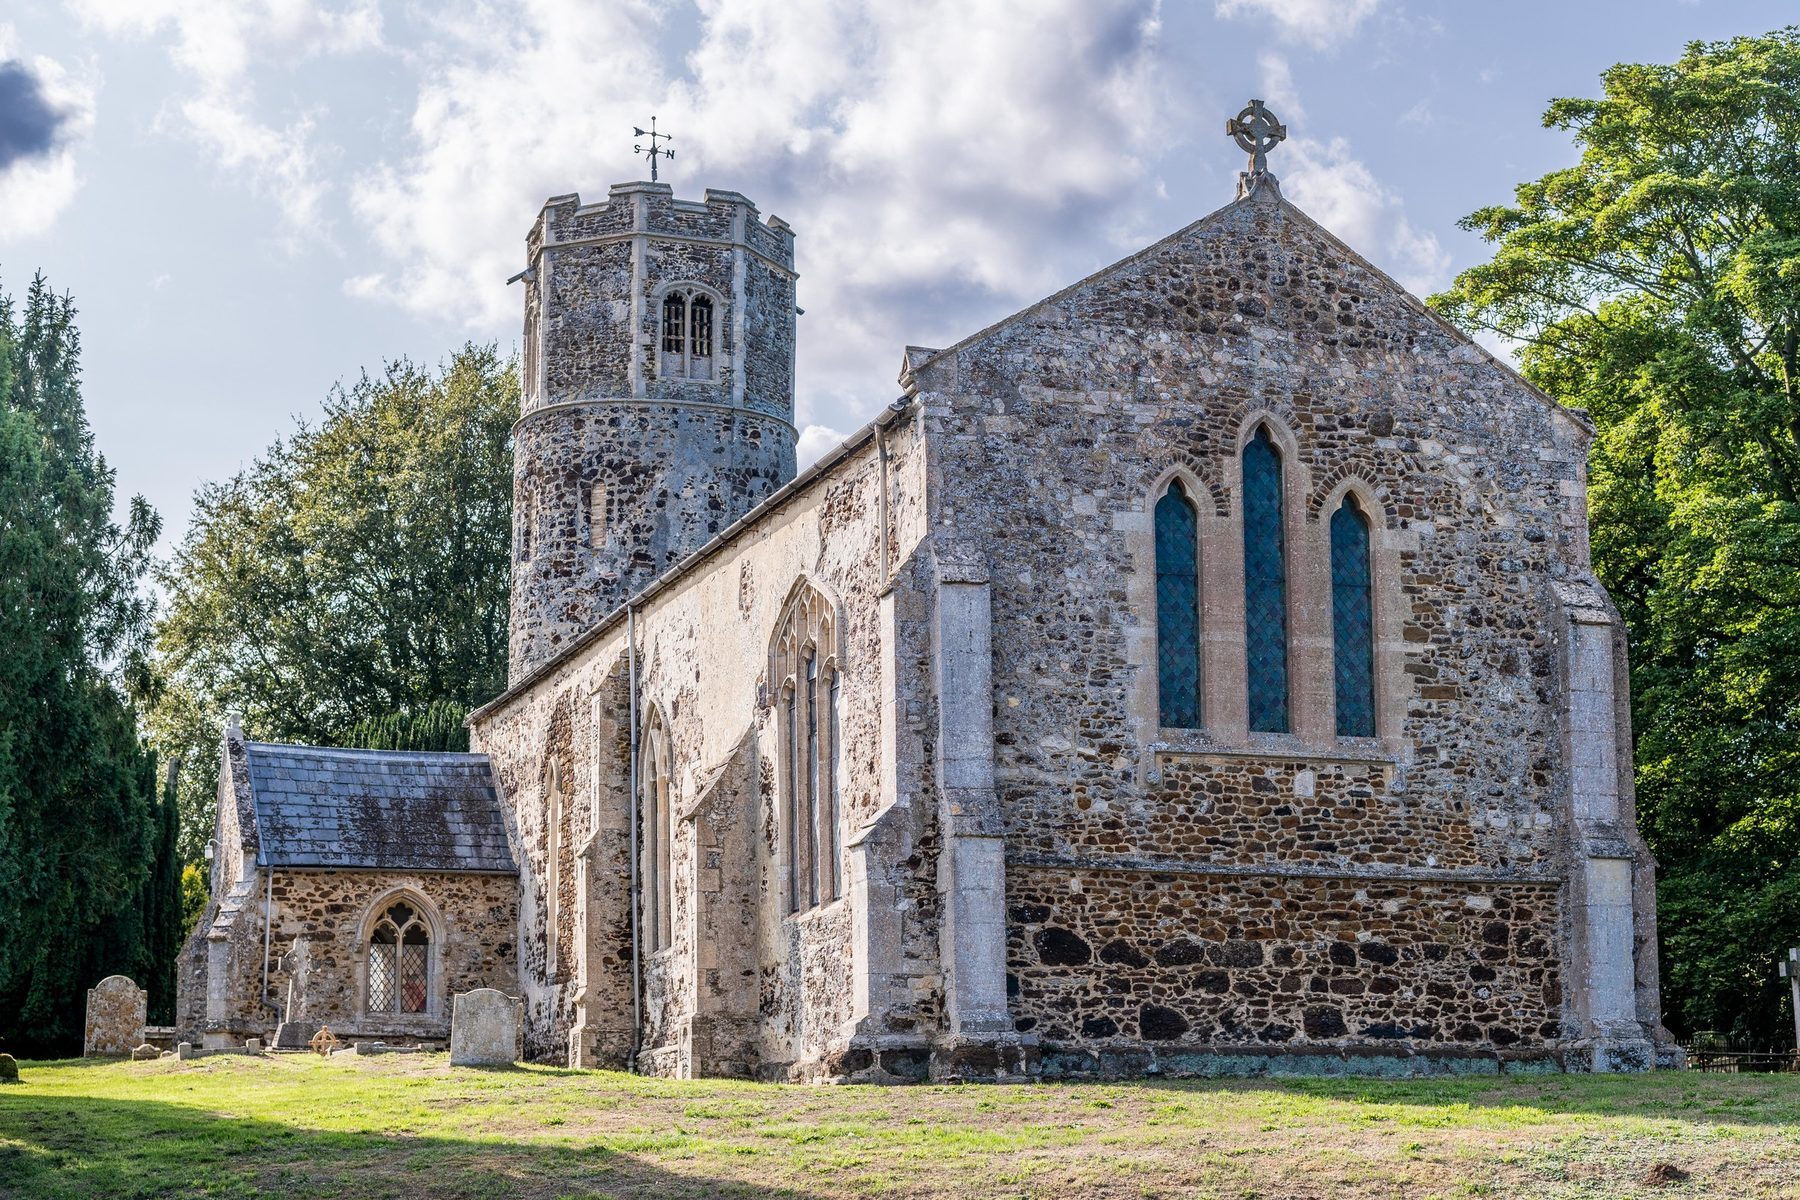 009 Bexwell Church 2018